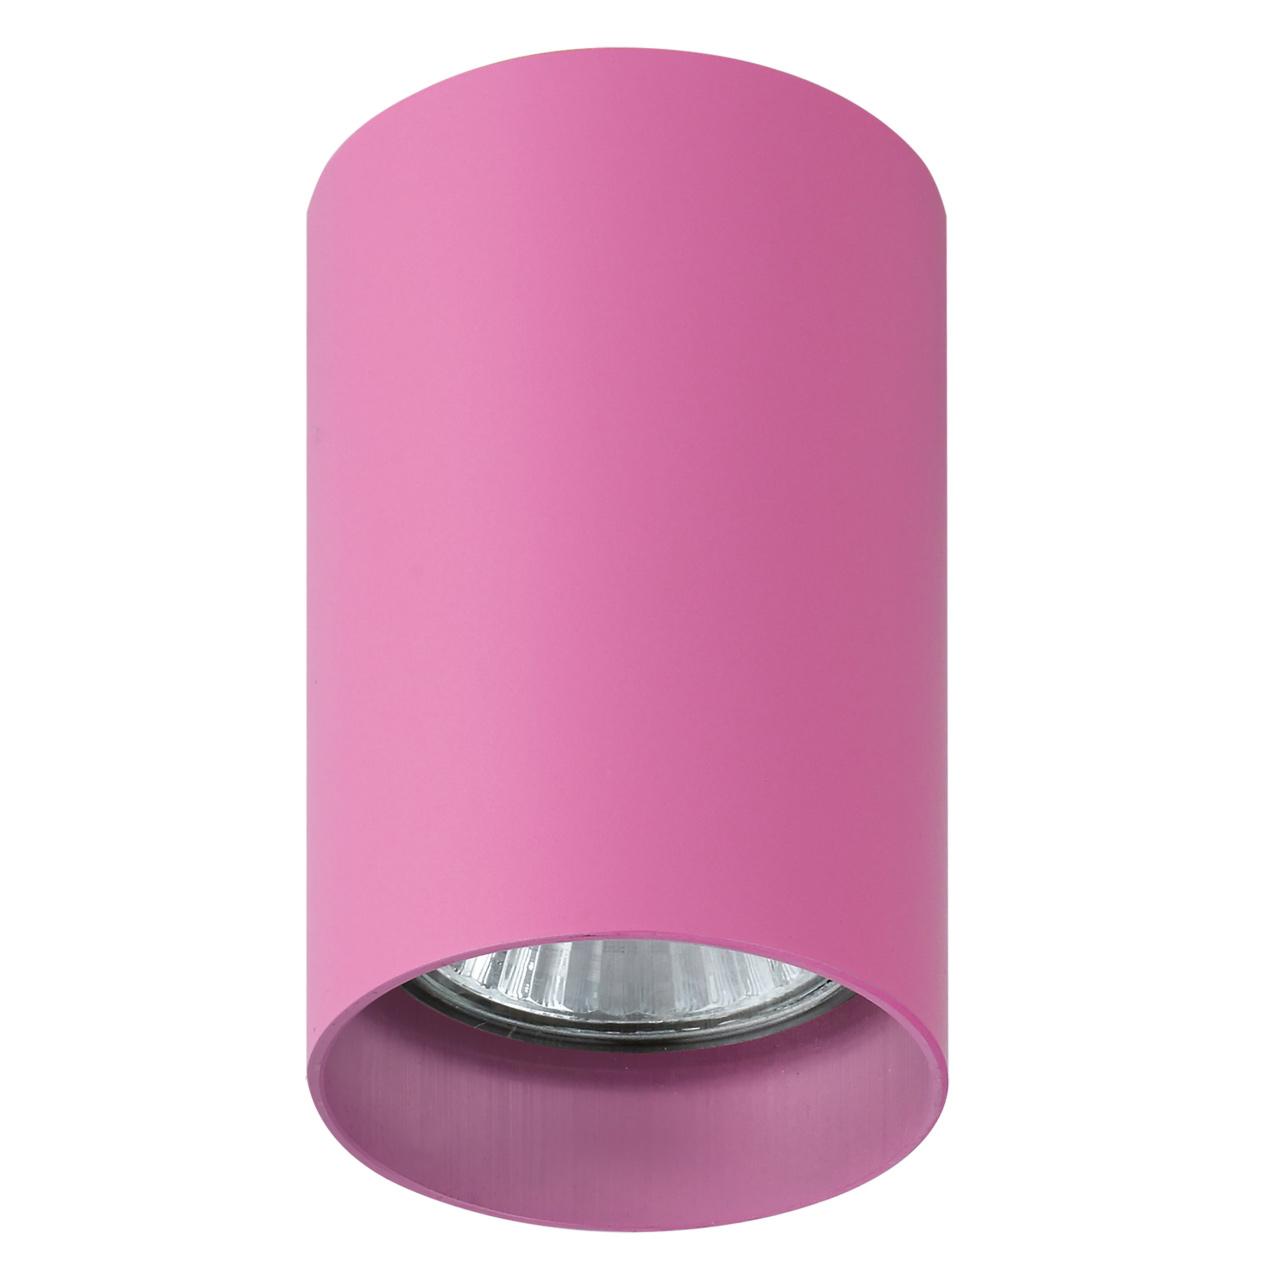 Светильник Rullo HP16 розовый Lightstar 214432